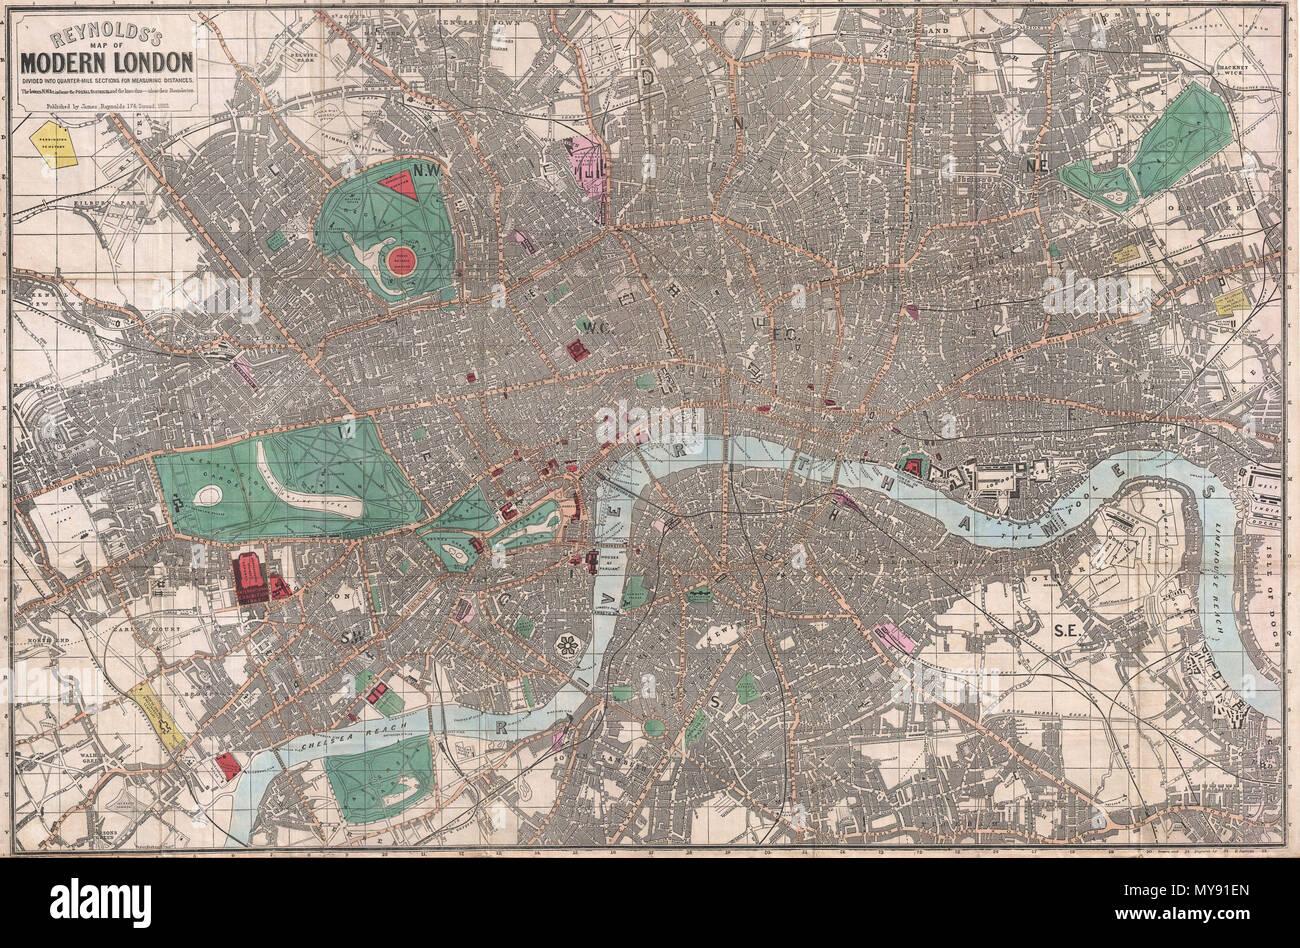 London Tourist Map Stockfotos & London Tourist Map Bilder ...